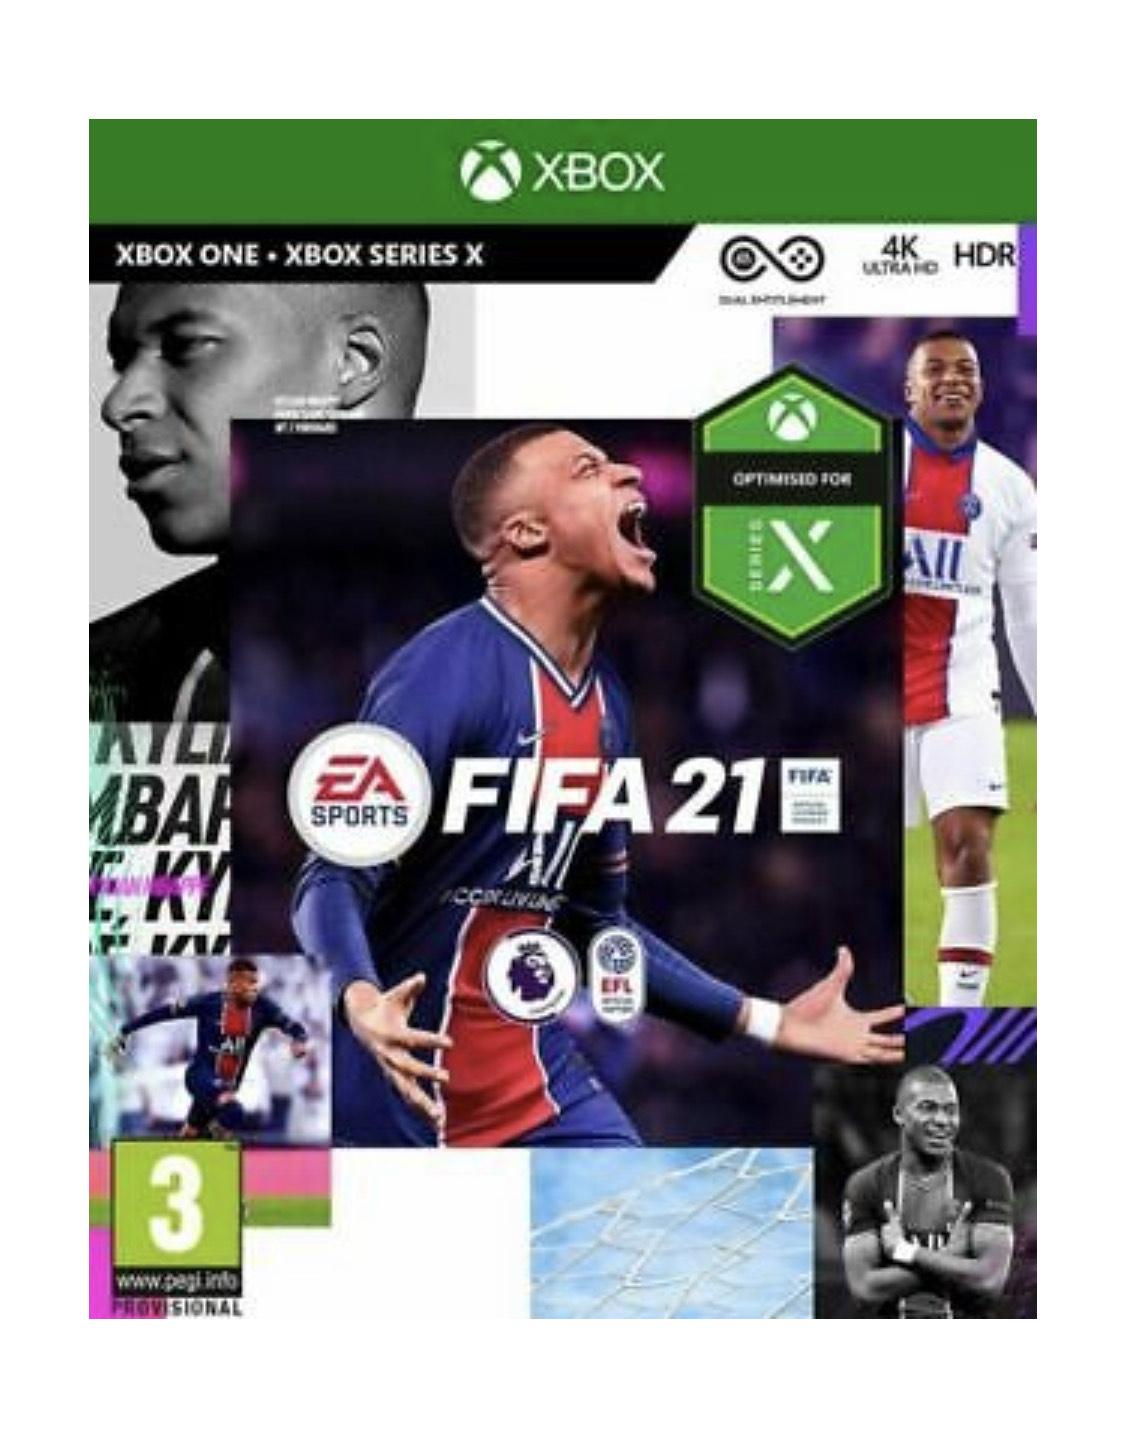 FIFA 21 XBOX Edition